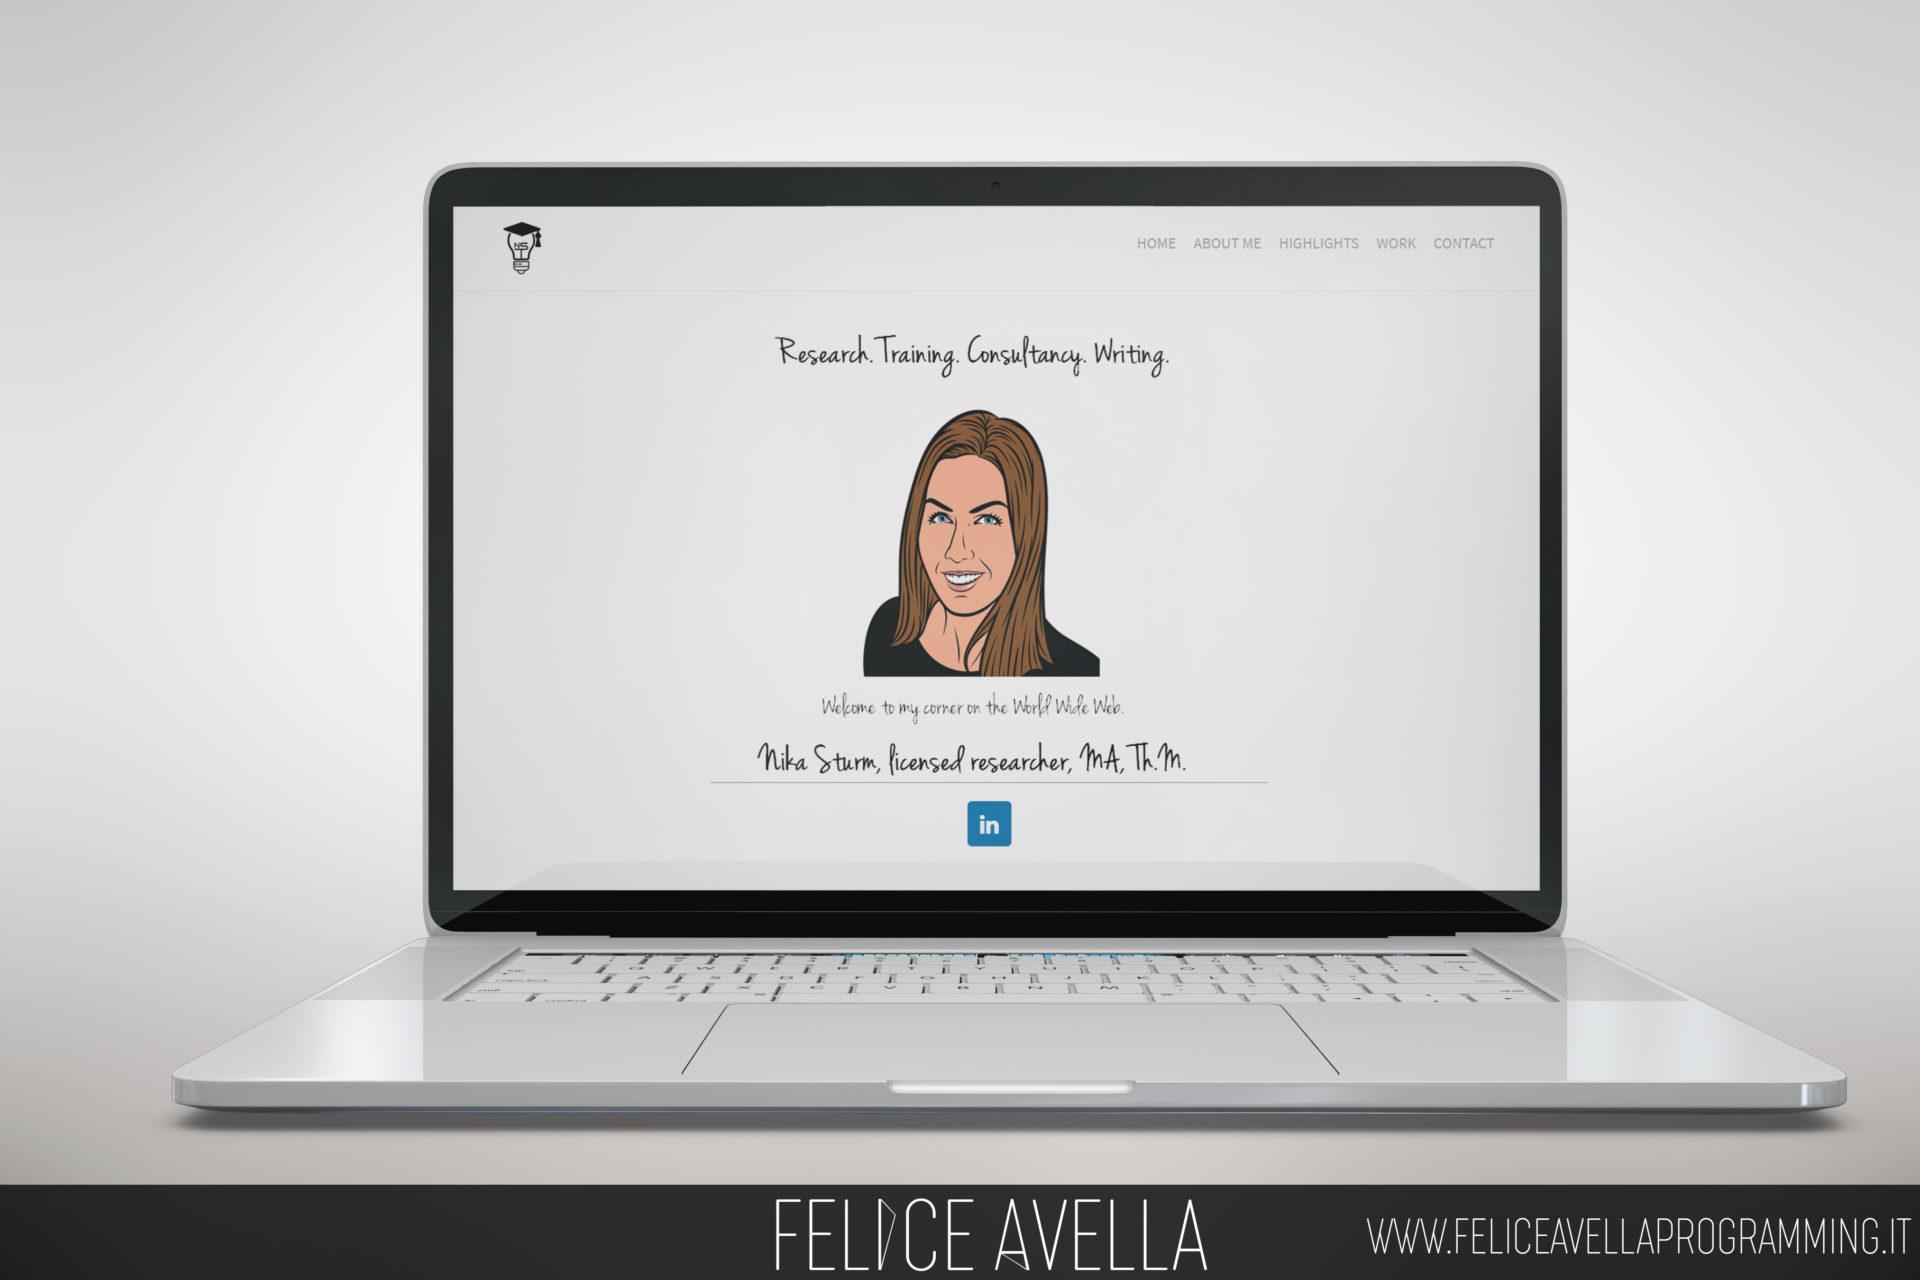 web design web site nika sturm